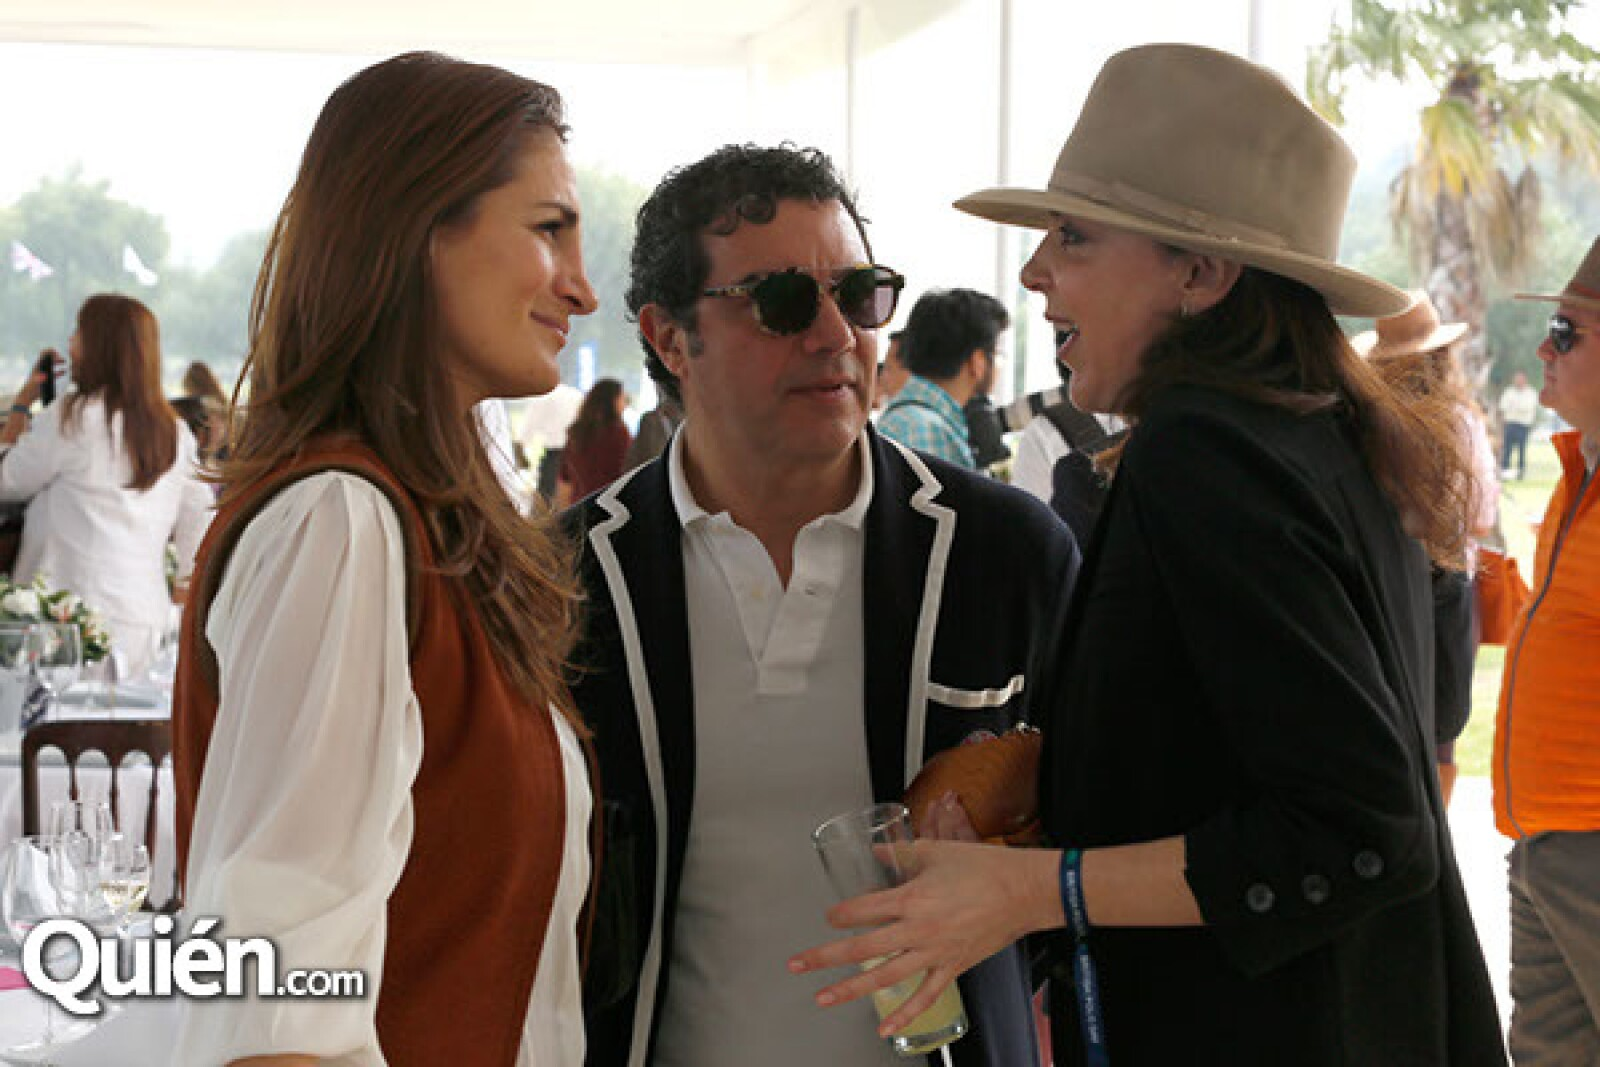 Carla Cortina,Alonso Taladrid y Claudia Marcucetti